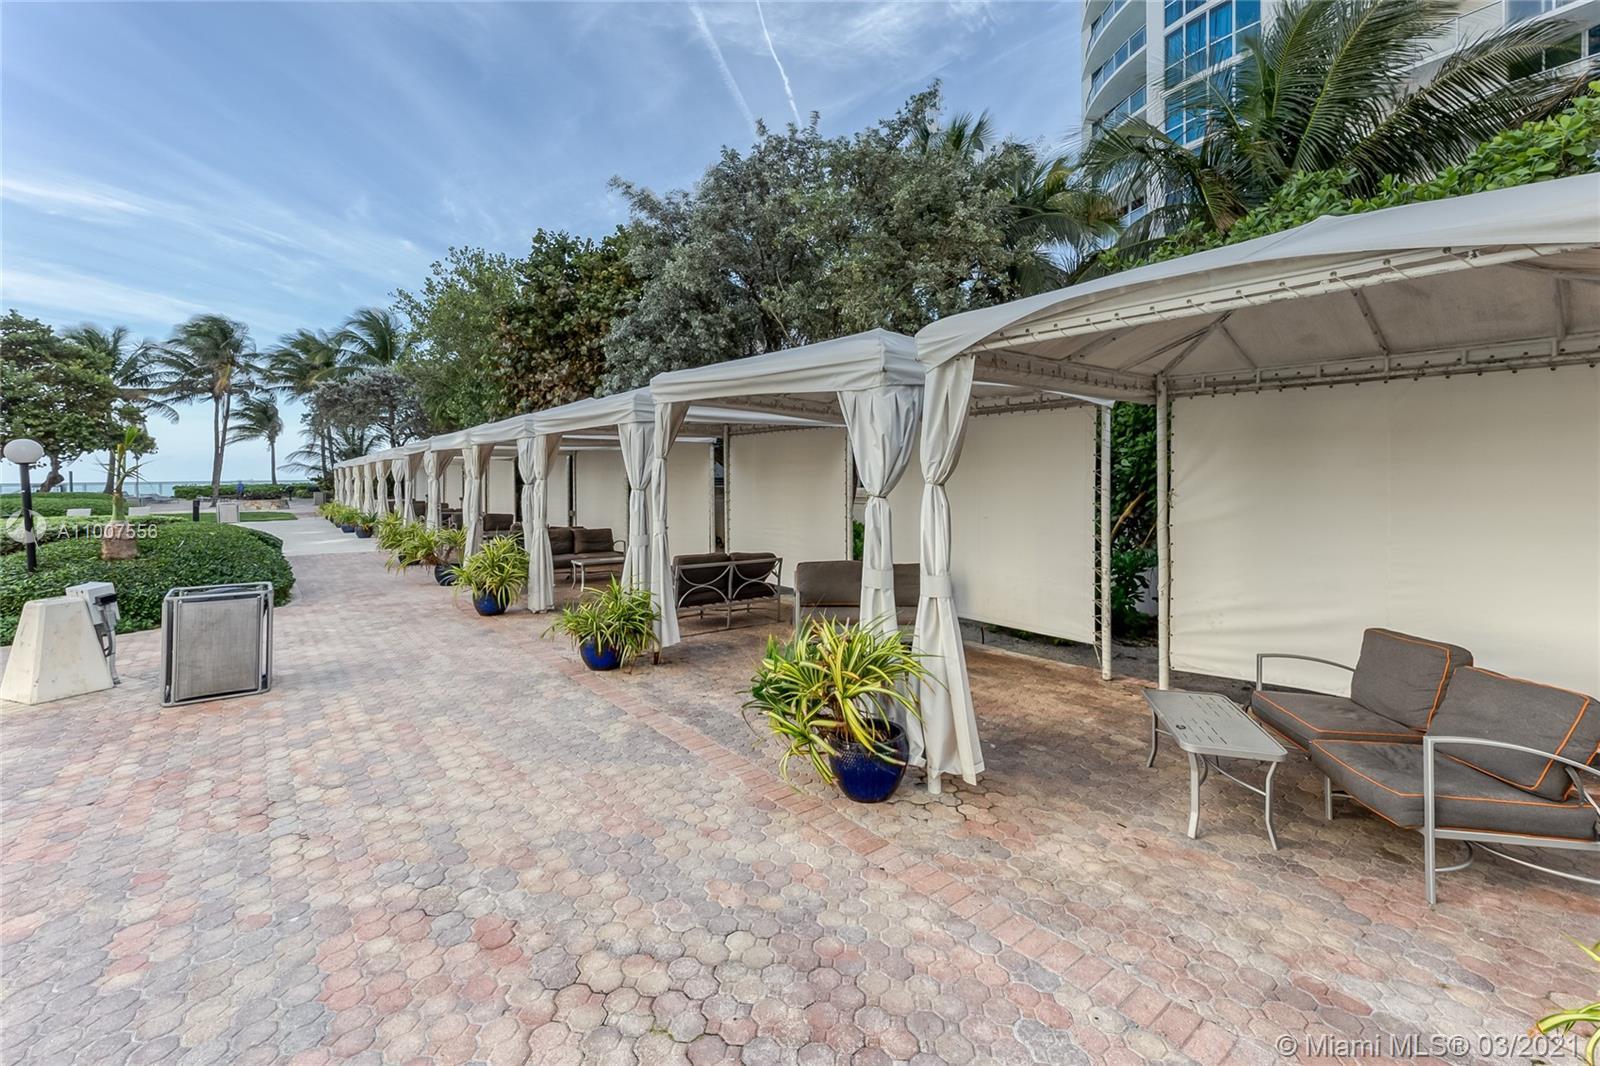 The Residences On Hollywood Beach image #22